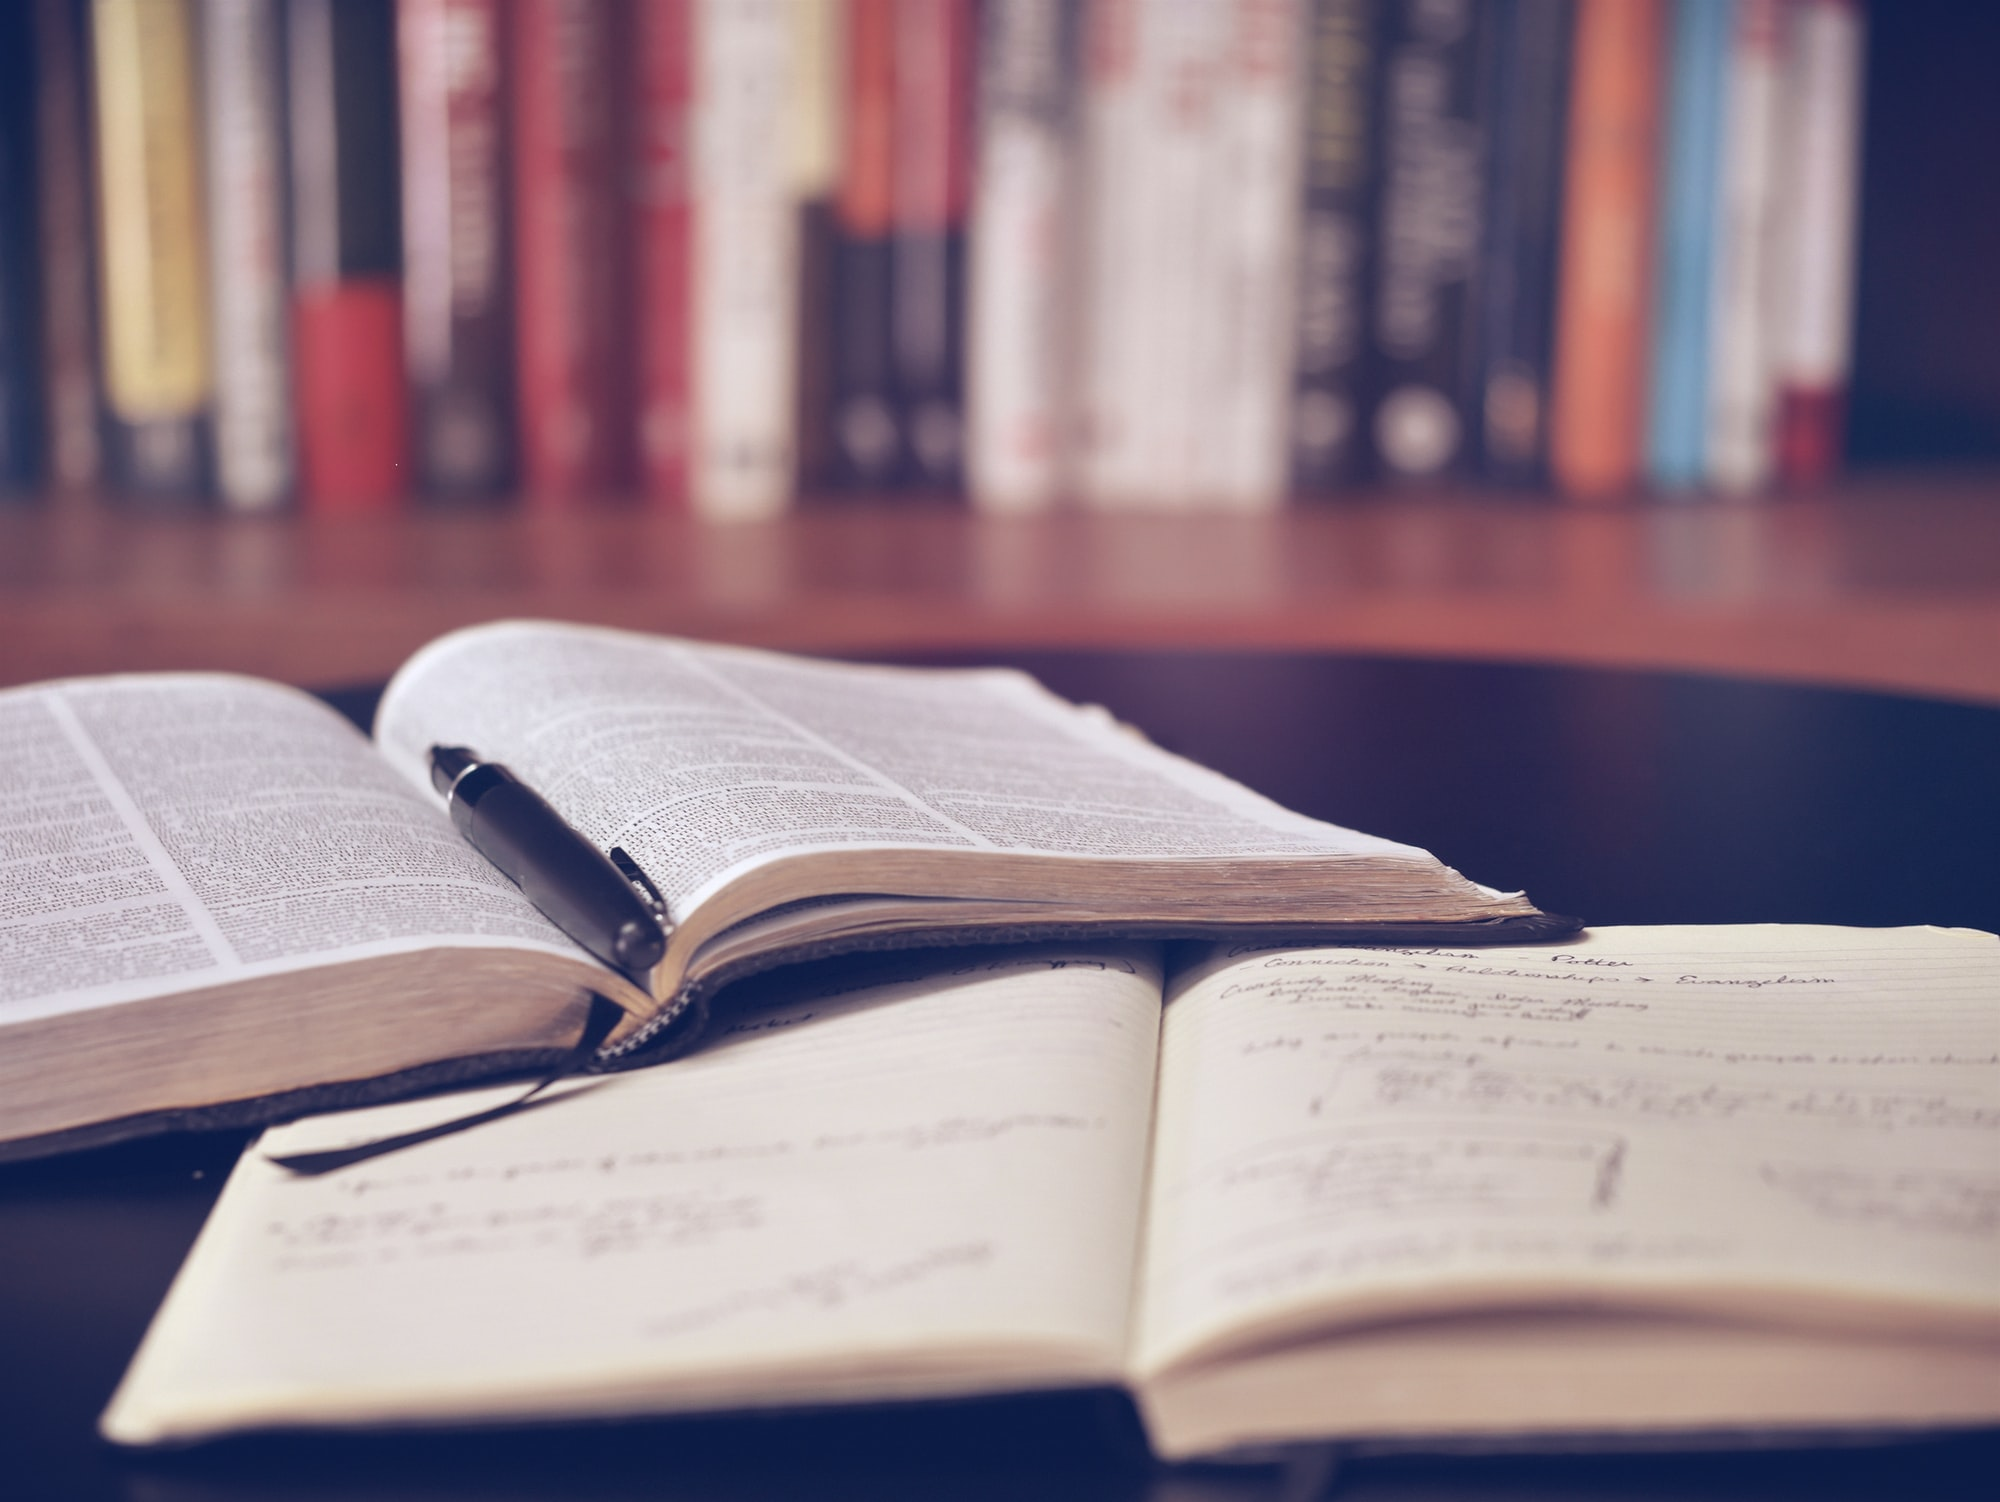 Cómo Estudiar para Motivarnos a Estudiar